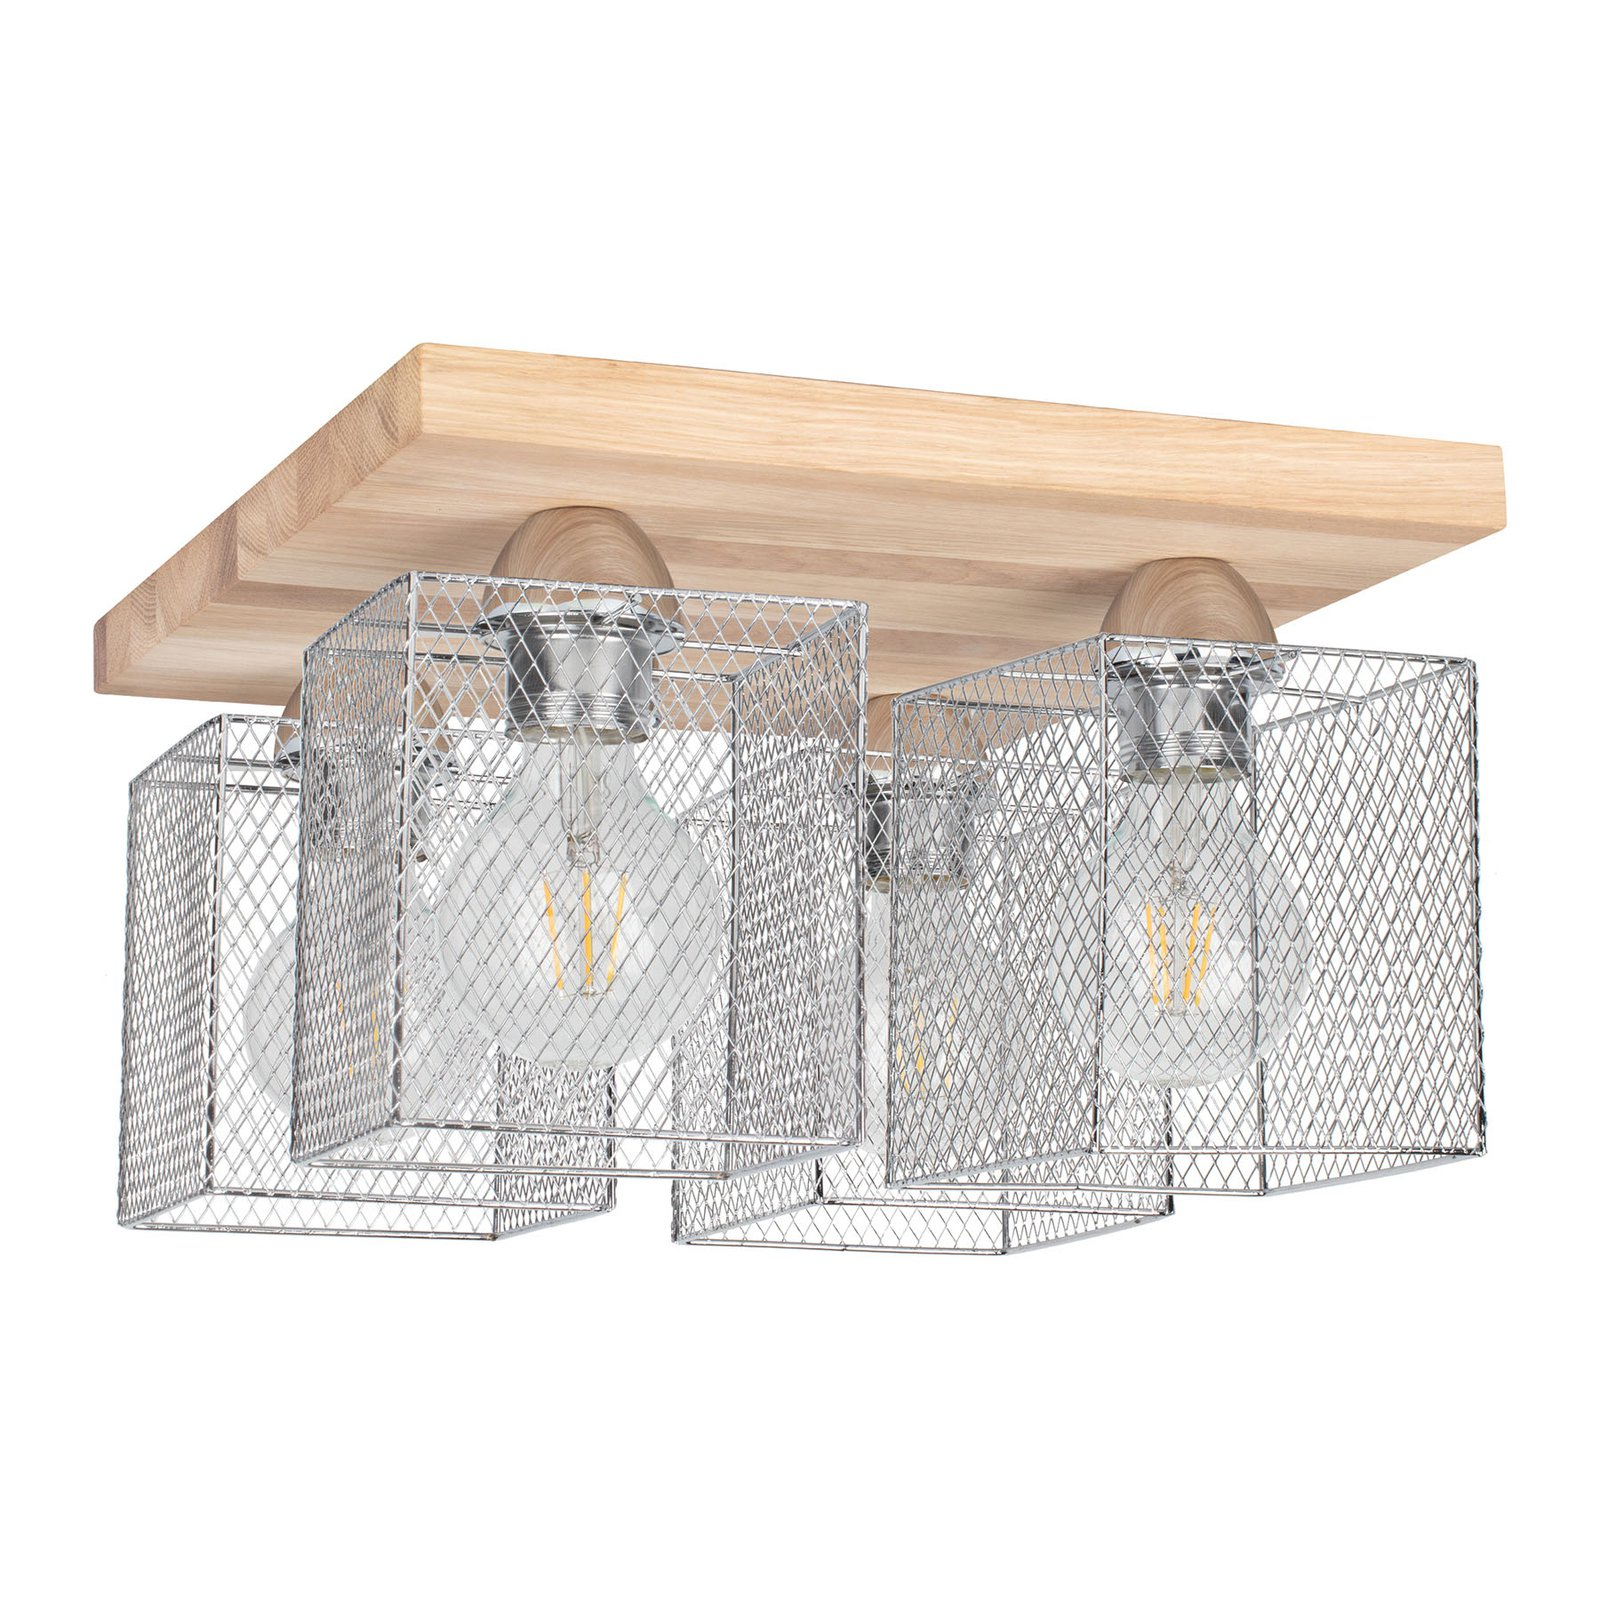 Taklampe Norman Wood 4 lyskilder, oljet eik